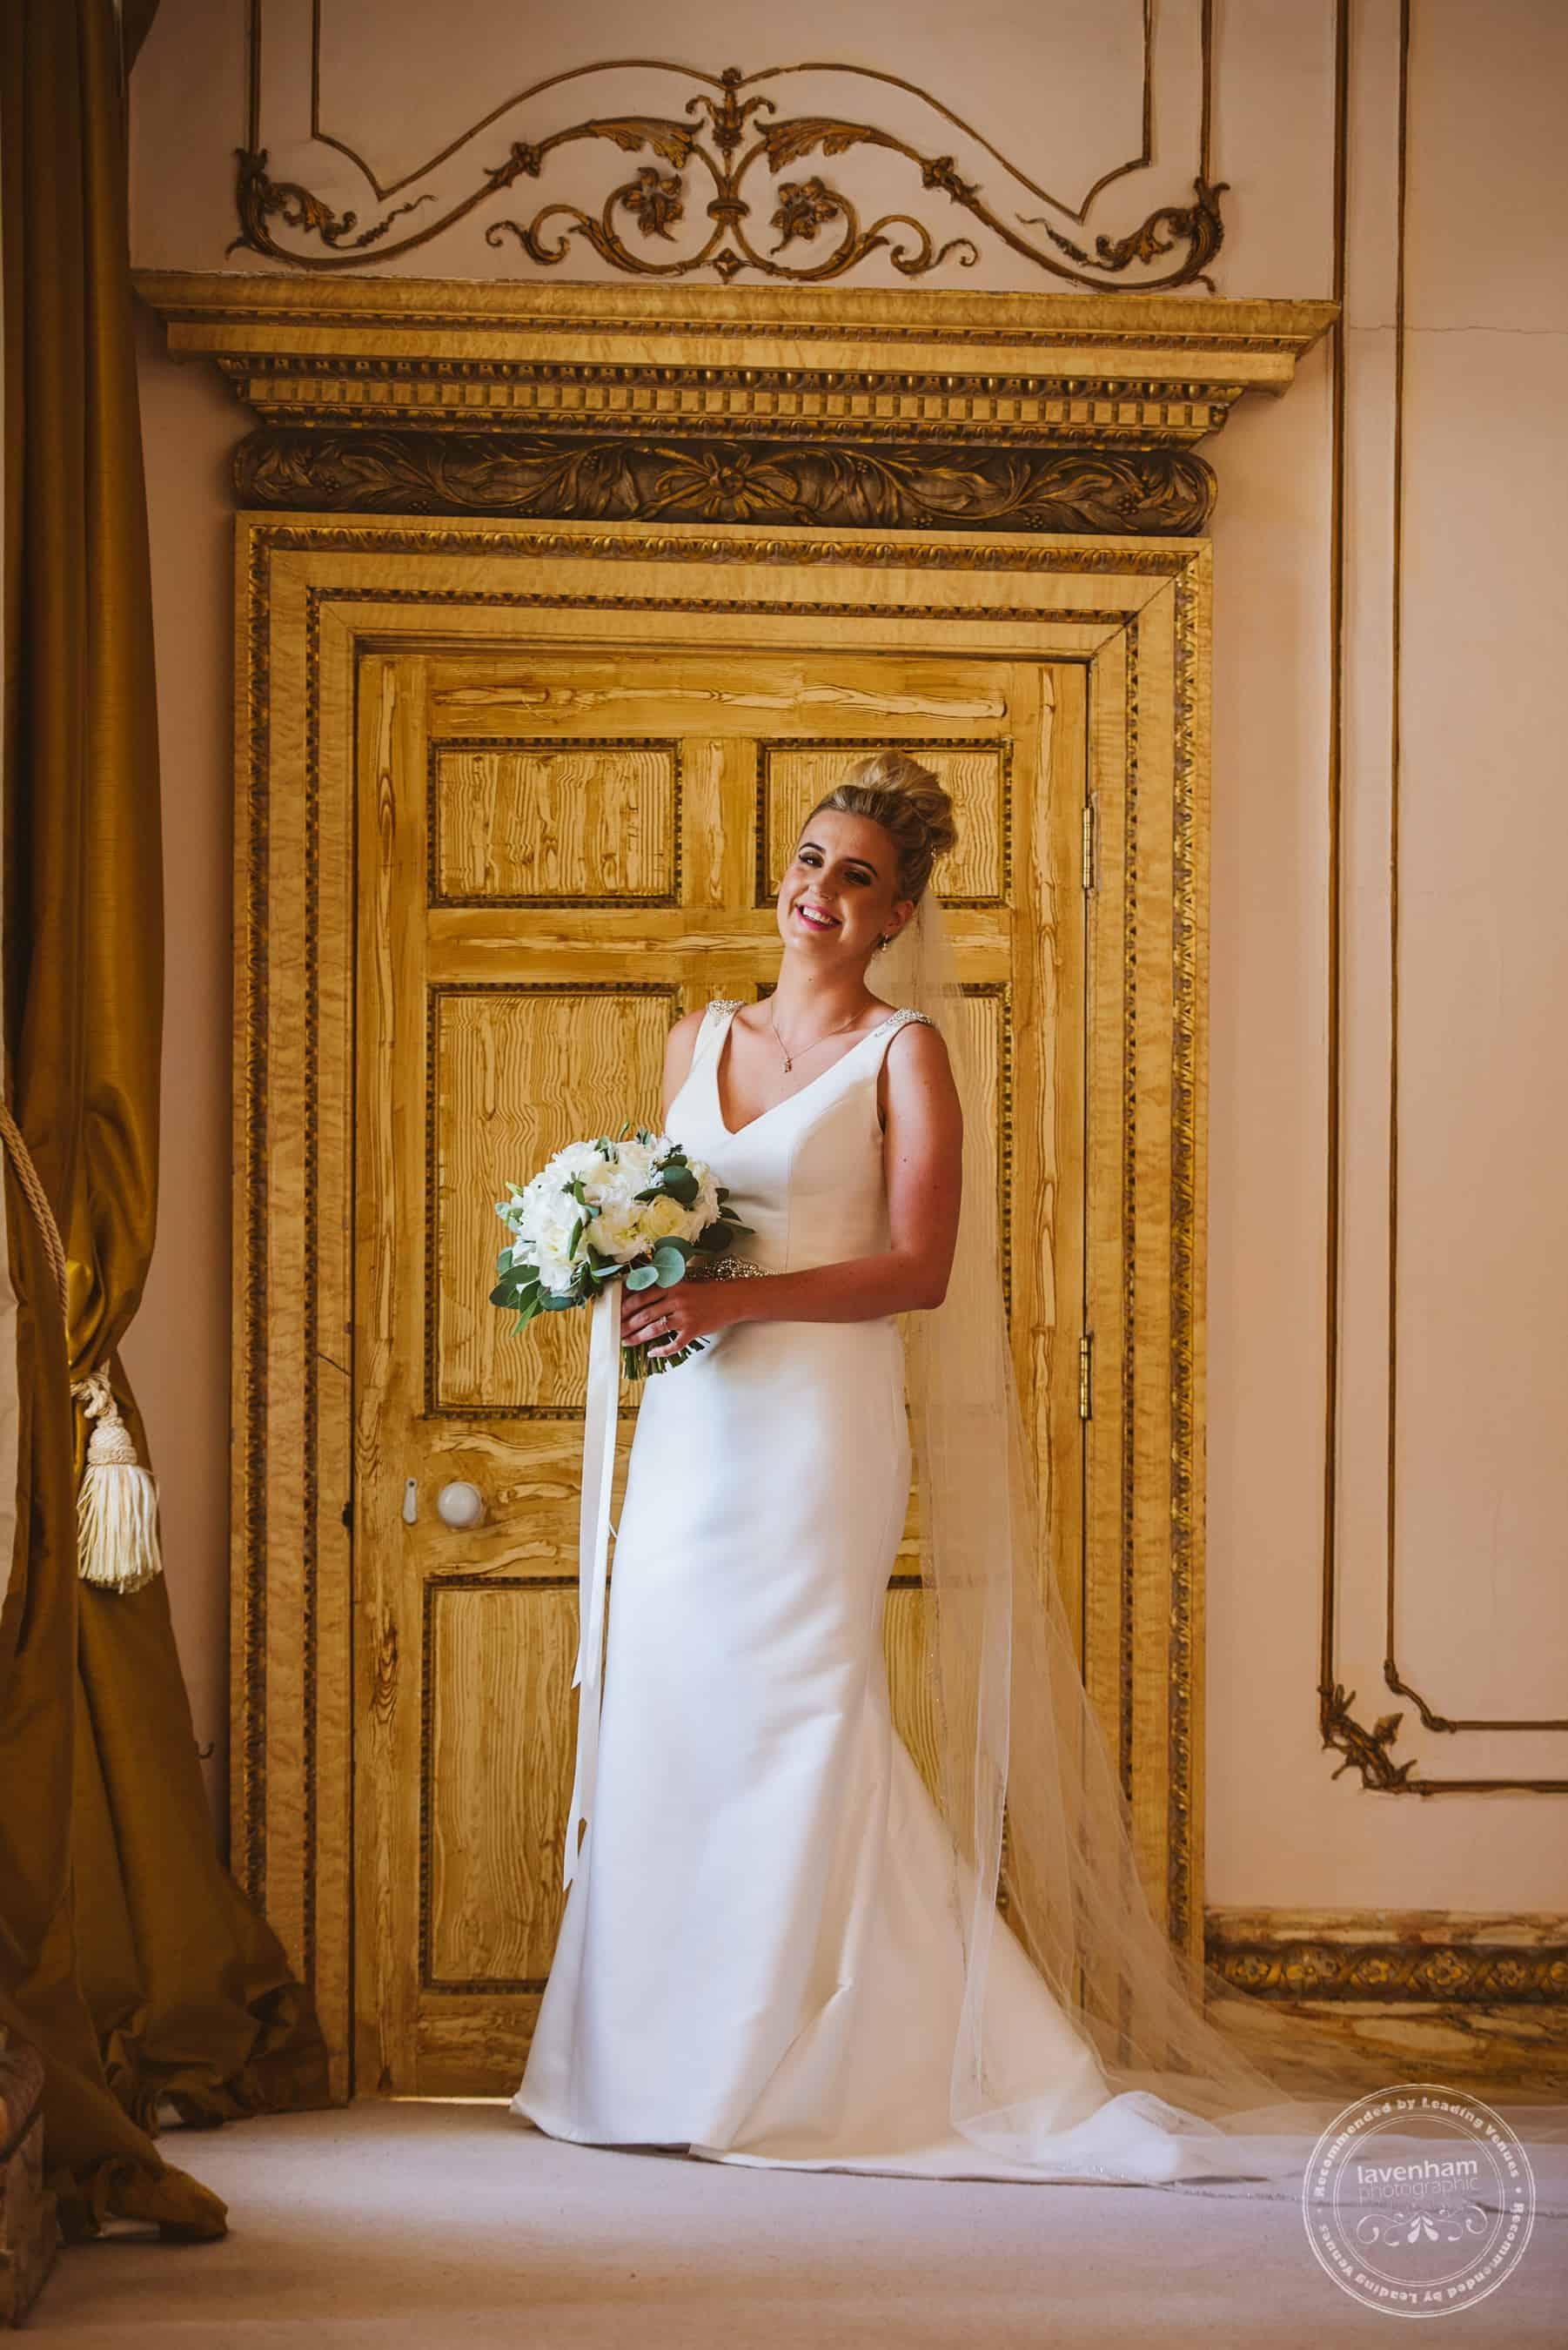 220618 Gosfield Hall Wedding Photography Lavenham Photographic 0030